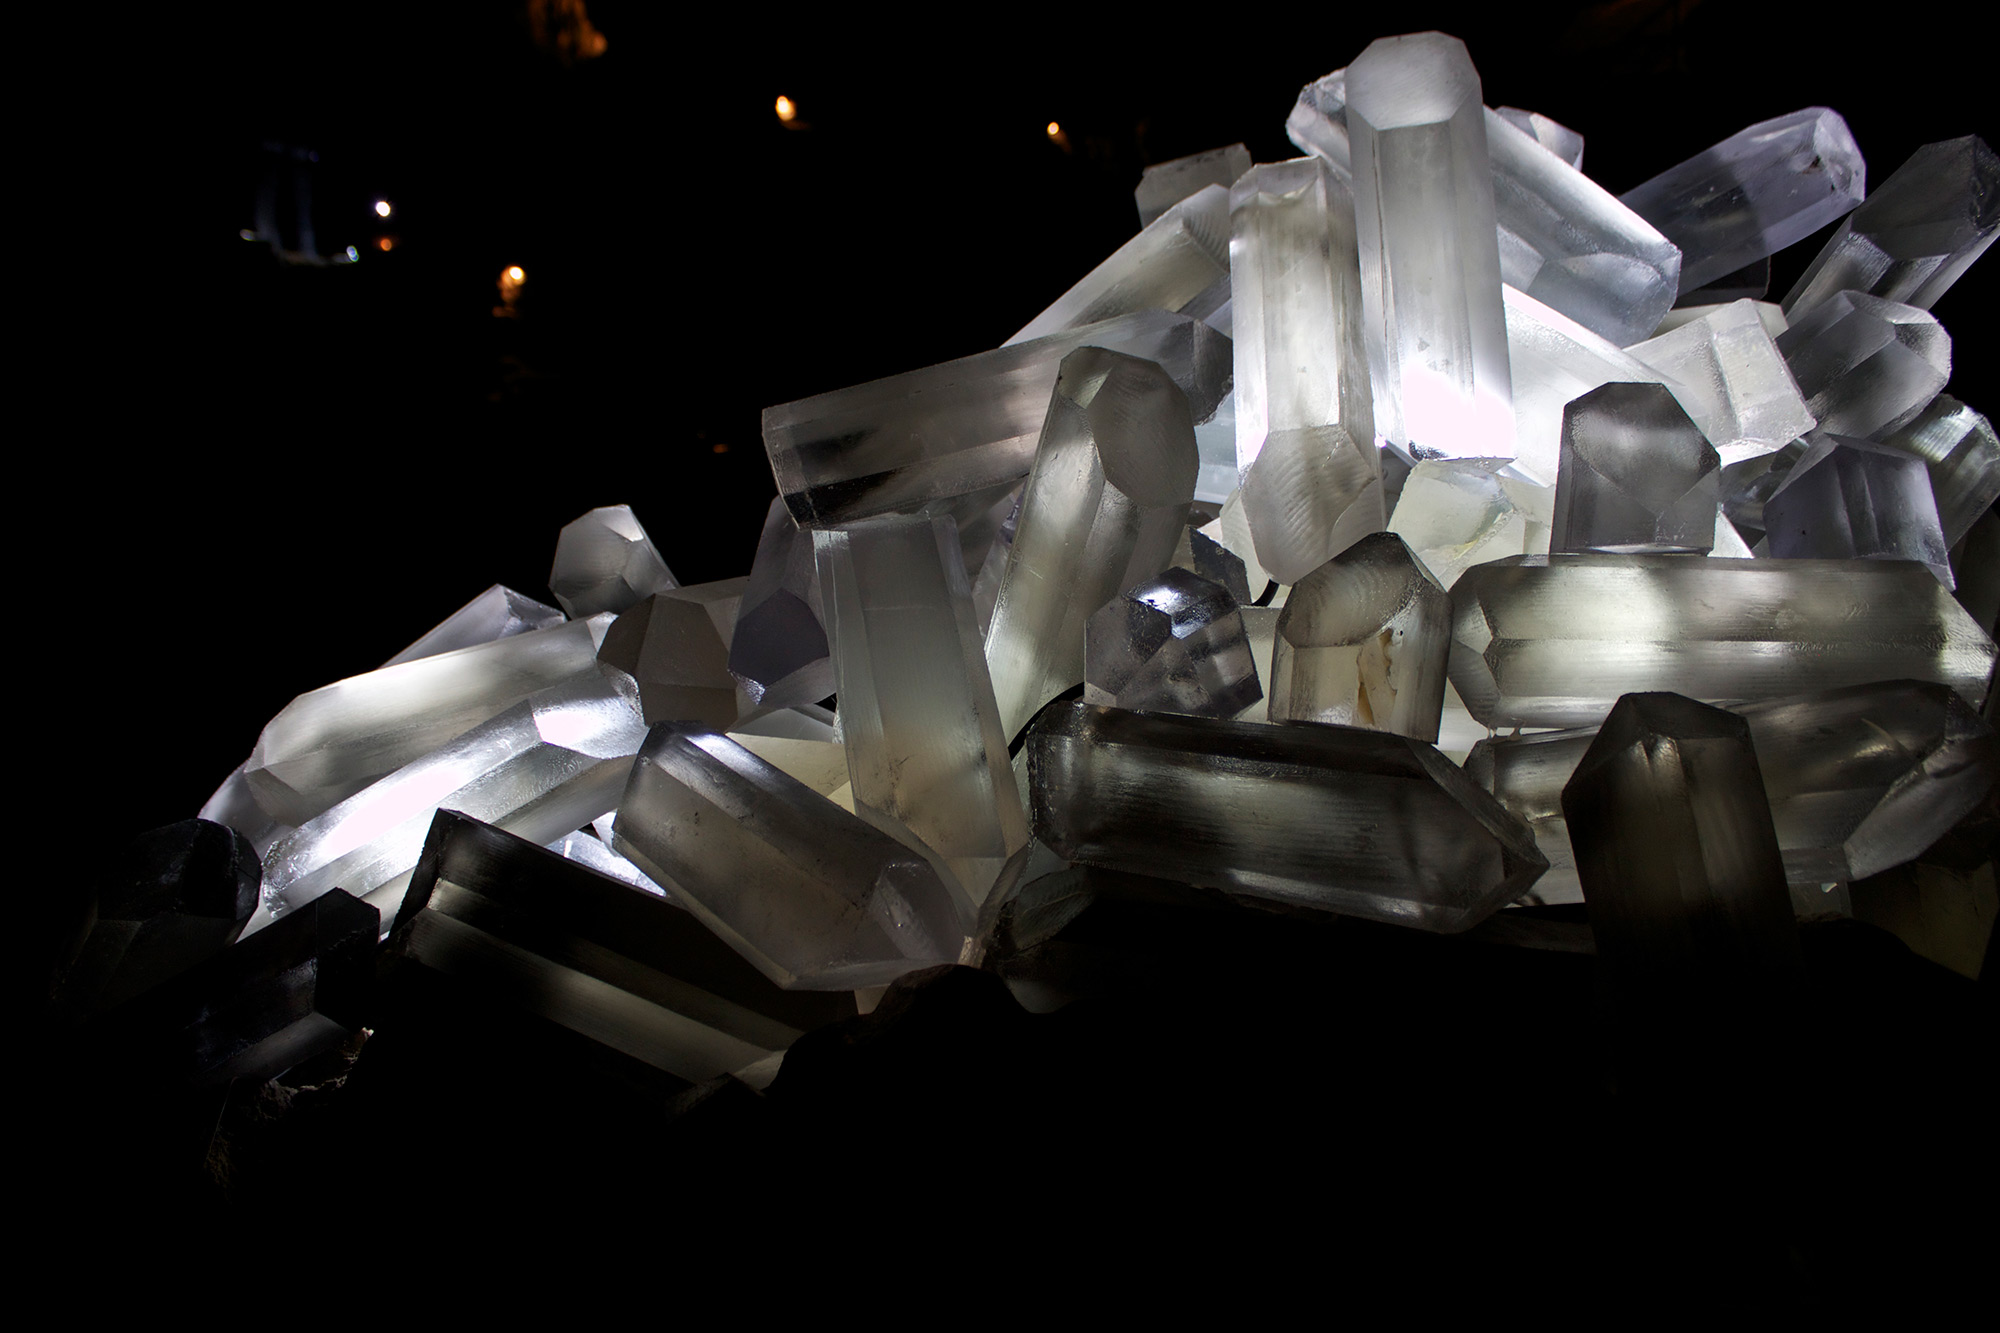 montagne-de-quartz-3.jpg